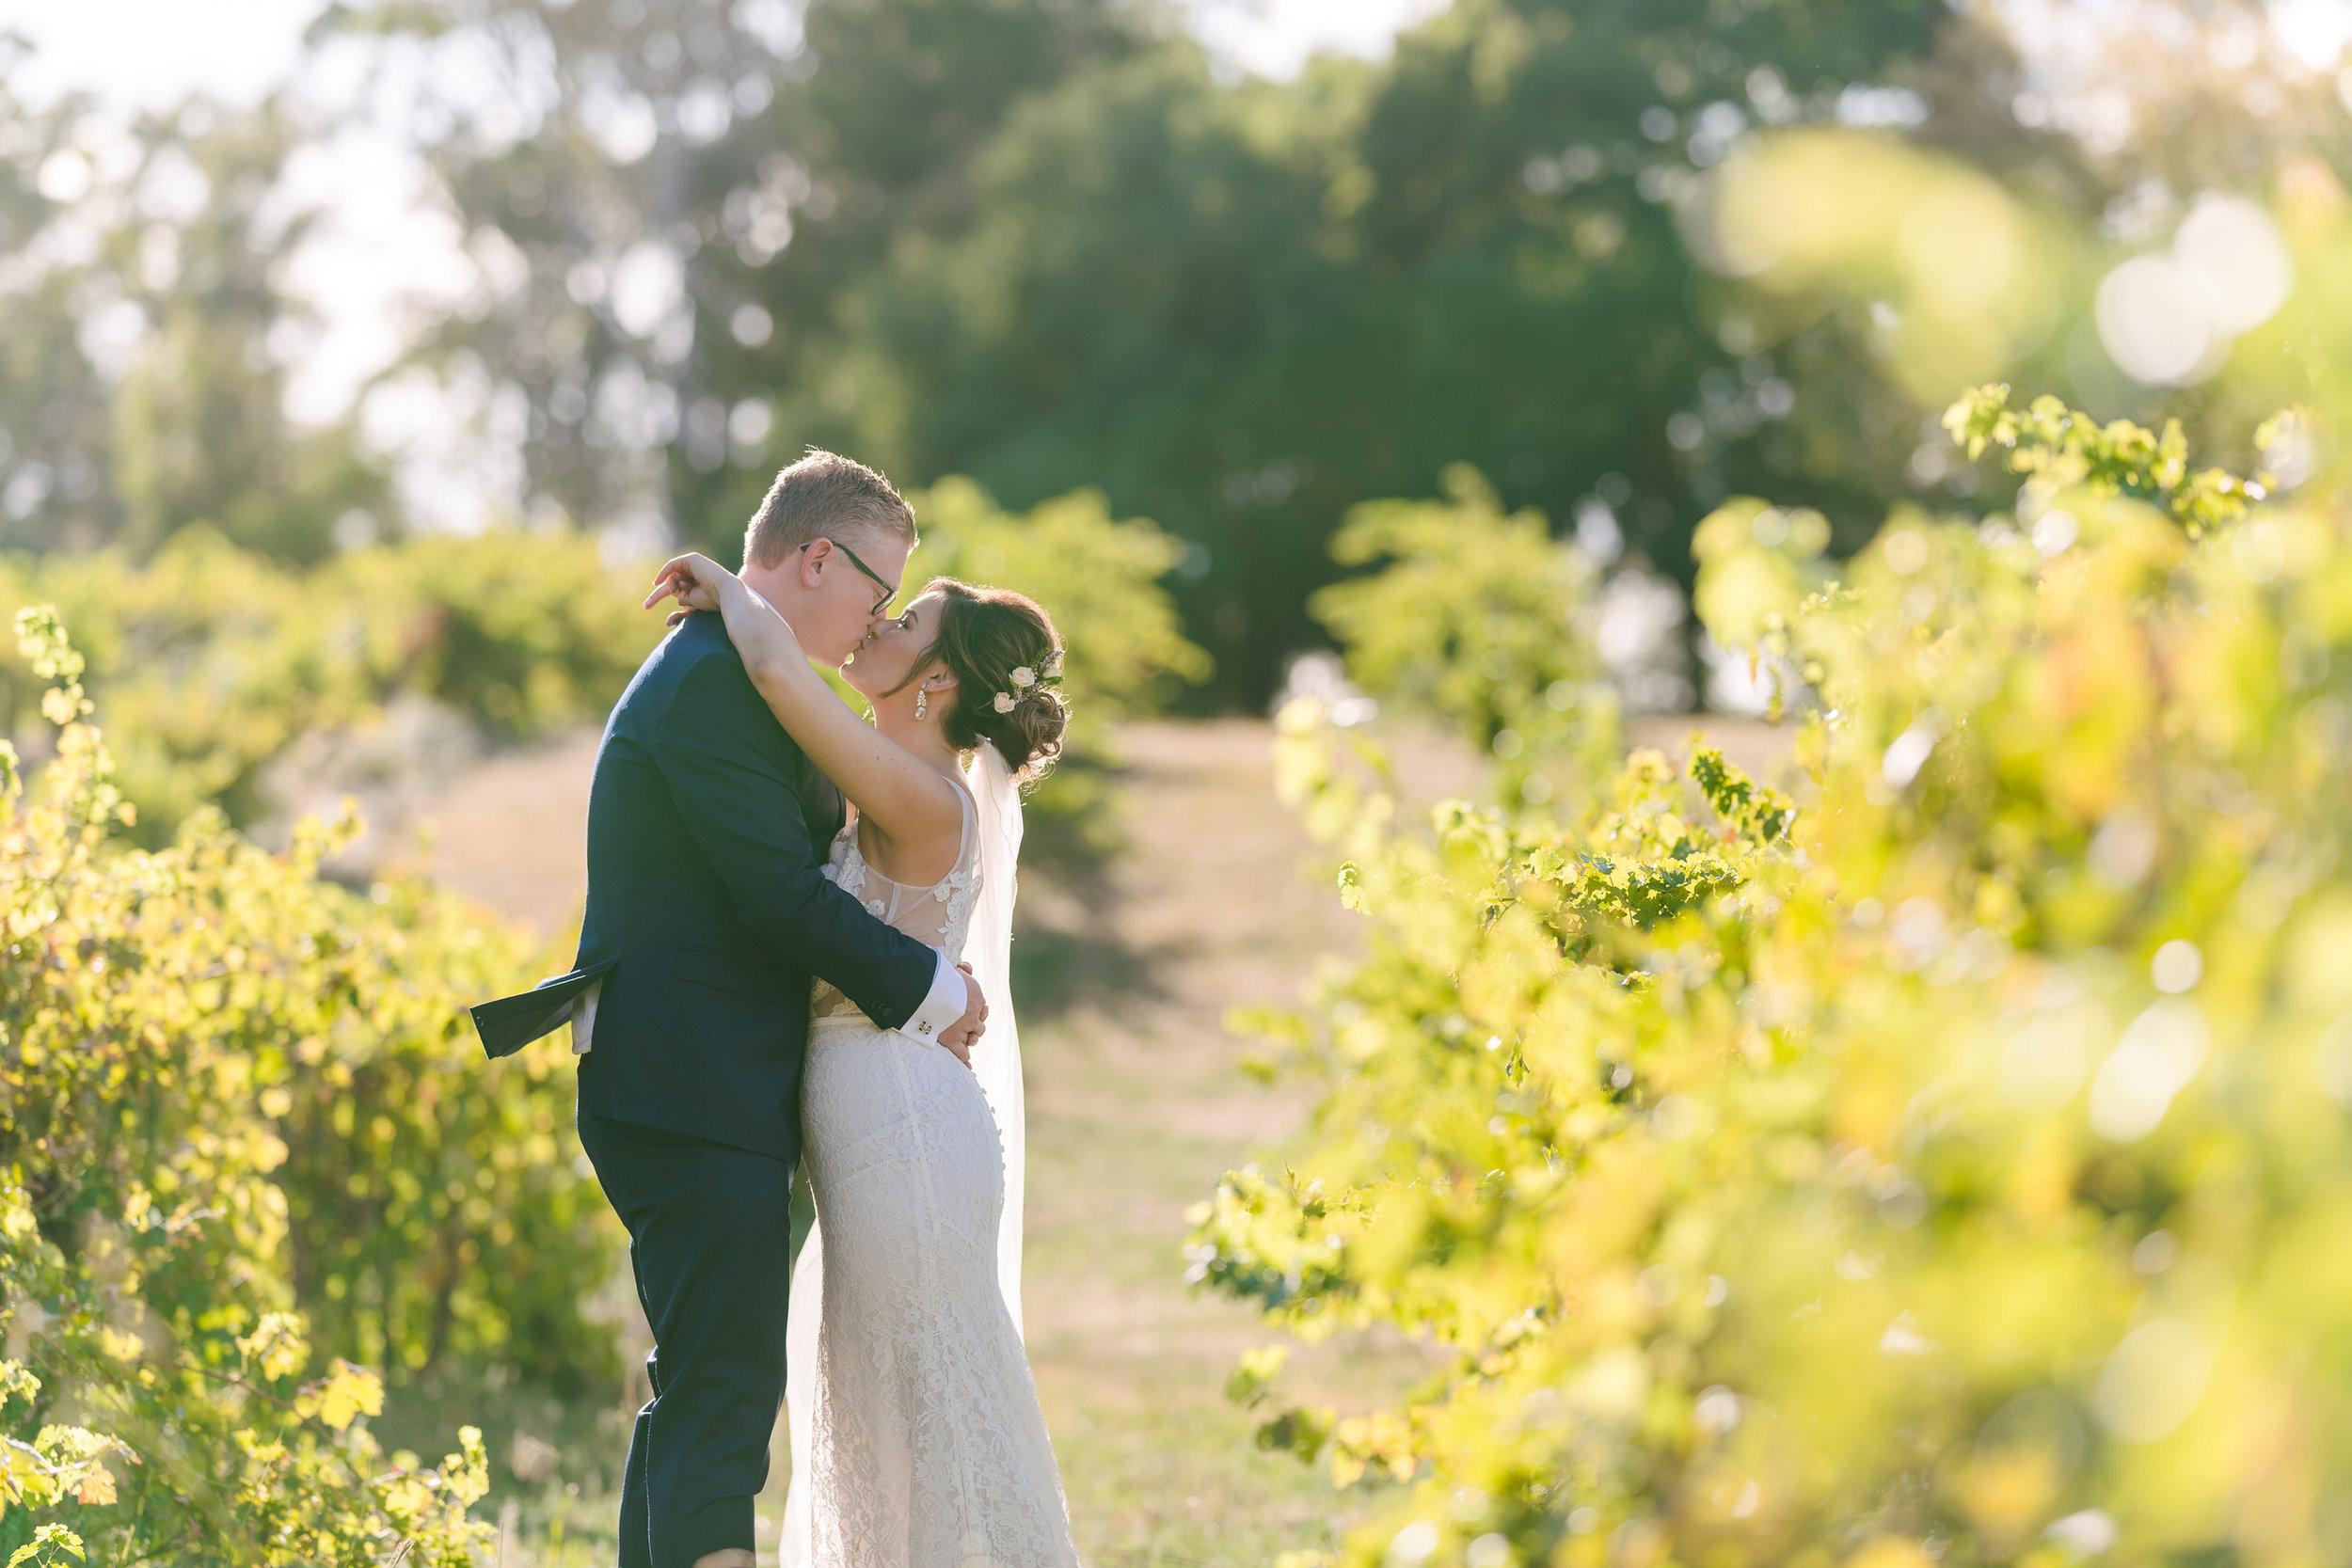 Justin_And_Jim_Photography_Chateau_Dore_Bendigo_Wedding67.JPG